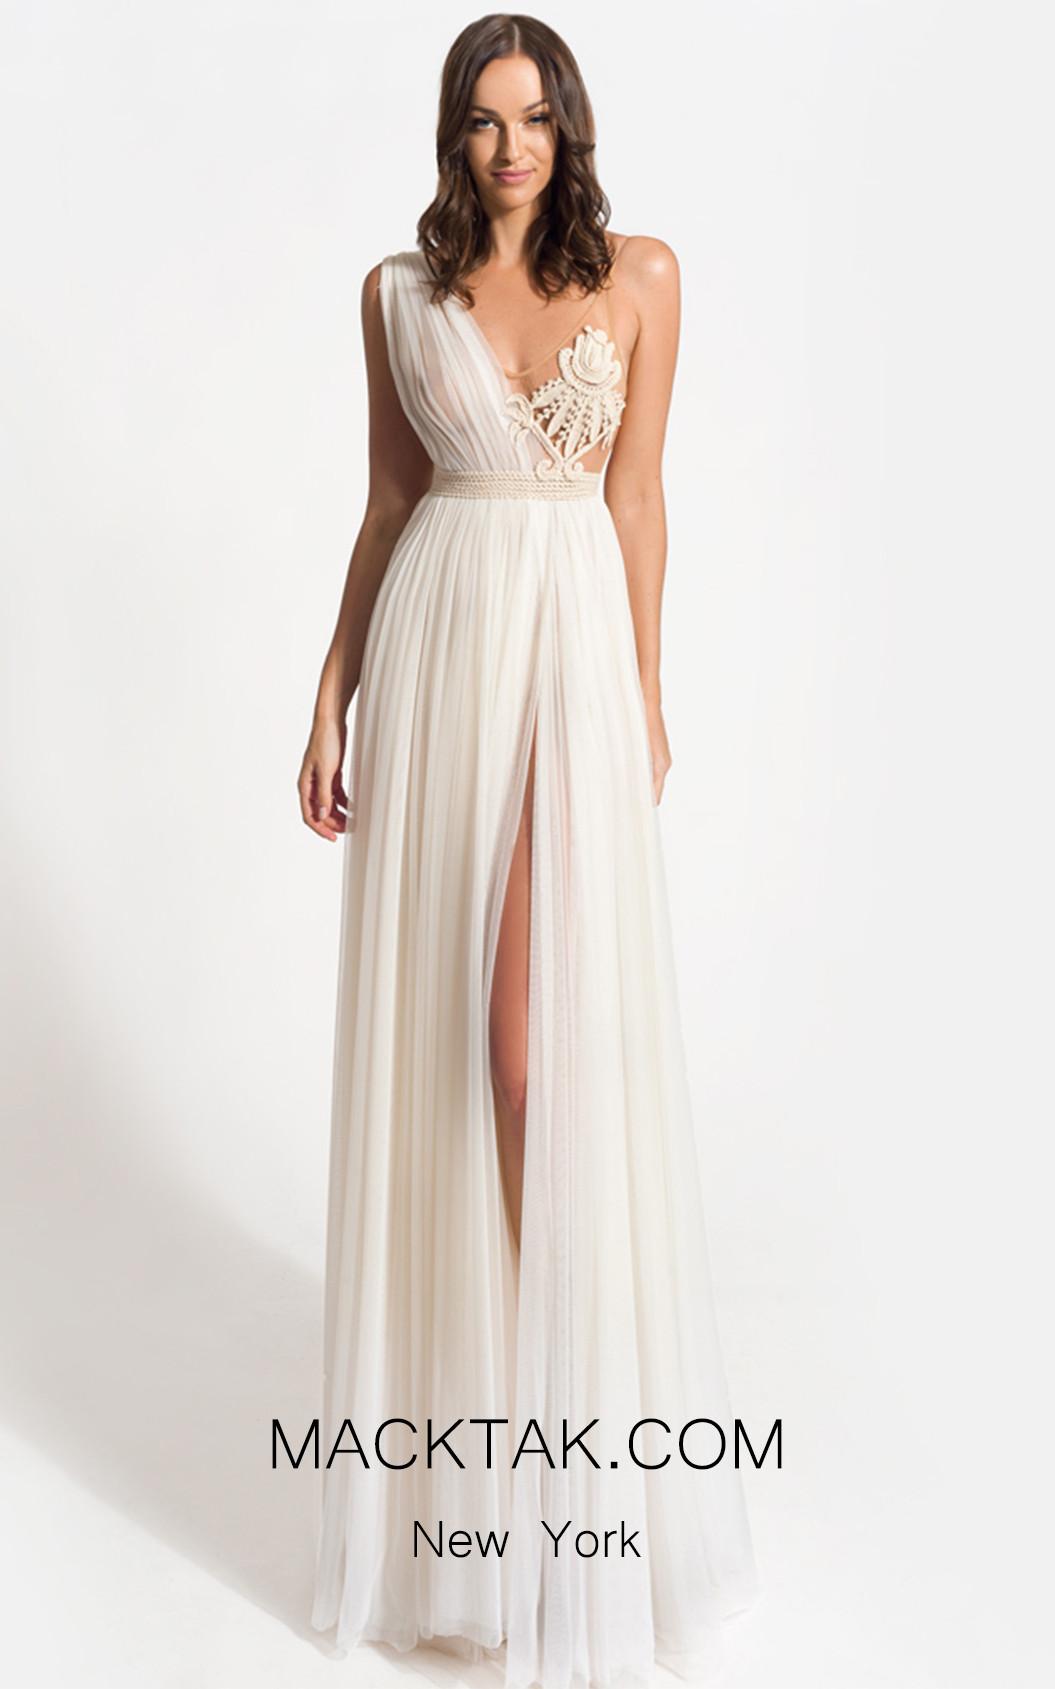 Zolotas Atelier Lyto Front Evening Dress